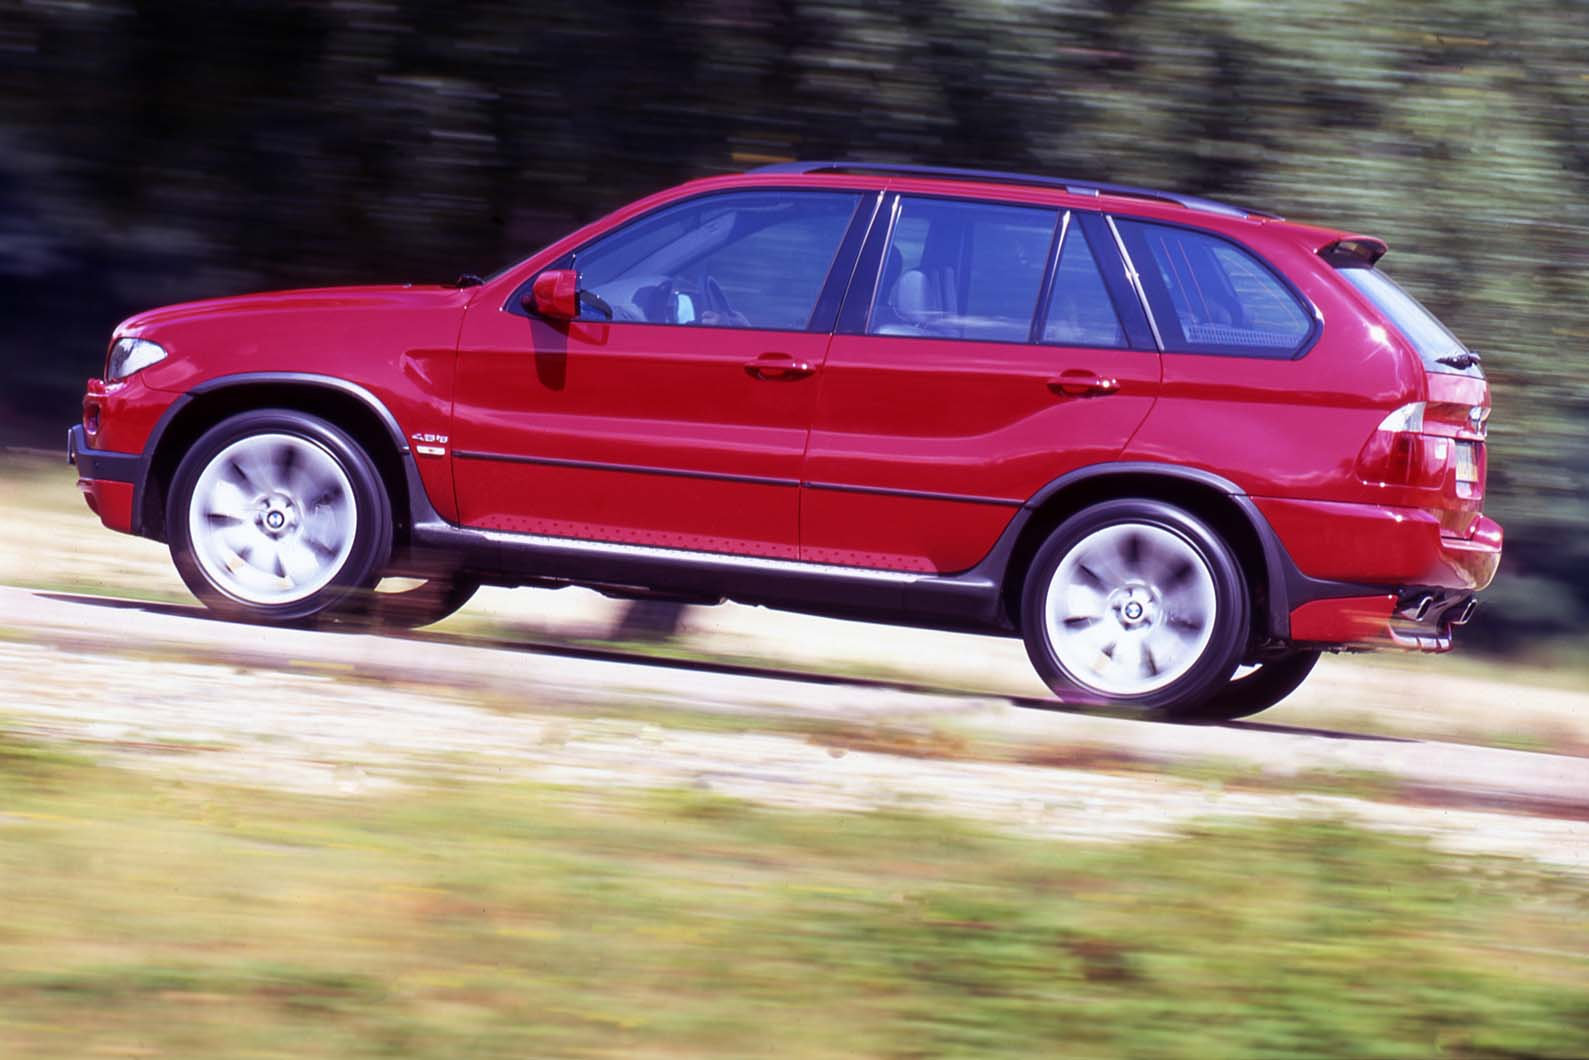 Used car buying guide: BMW X5 | Autocar